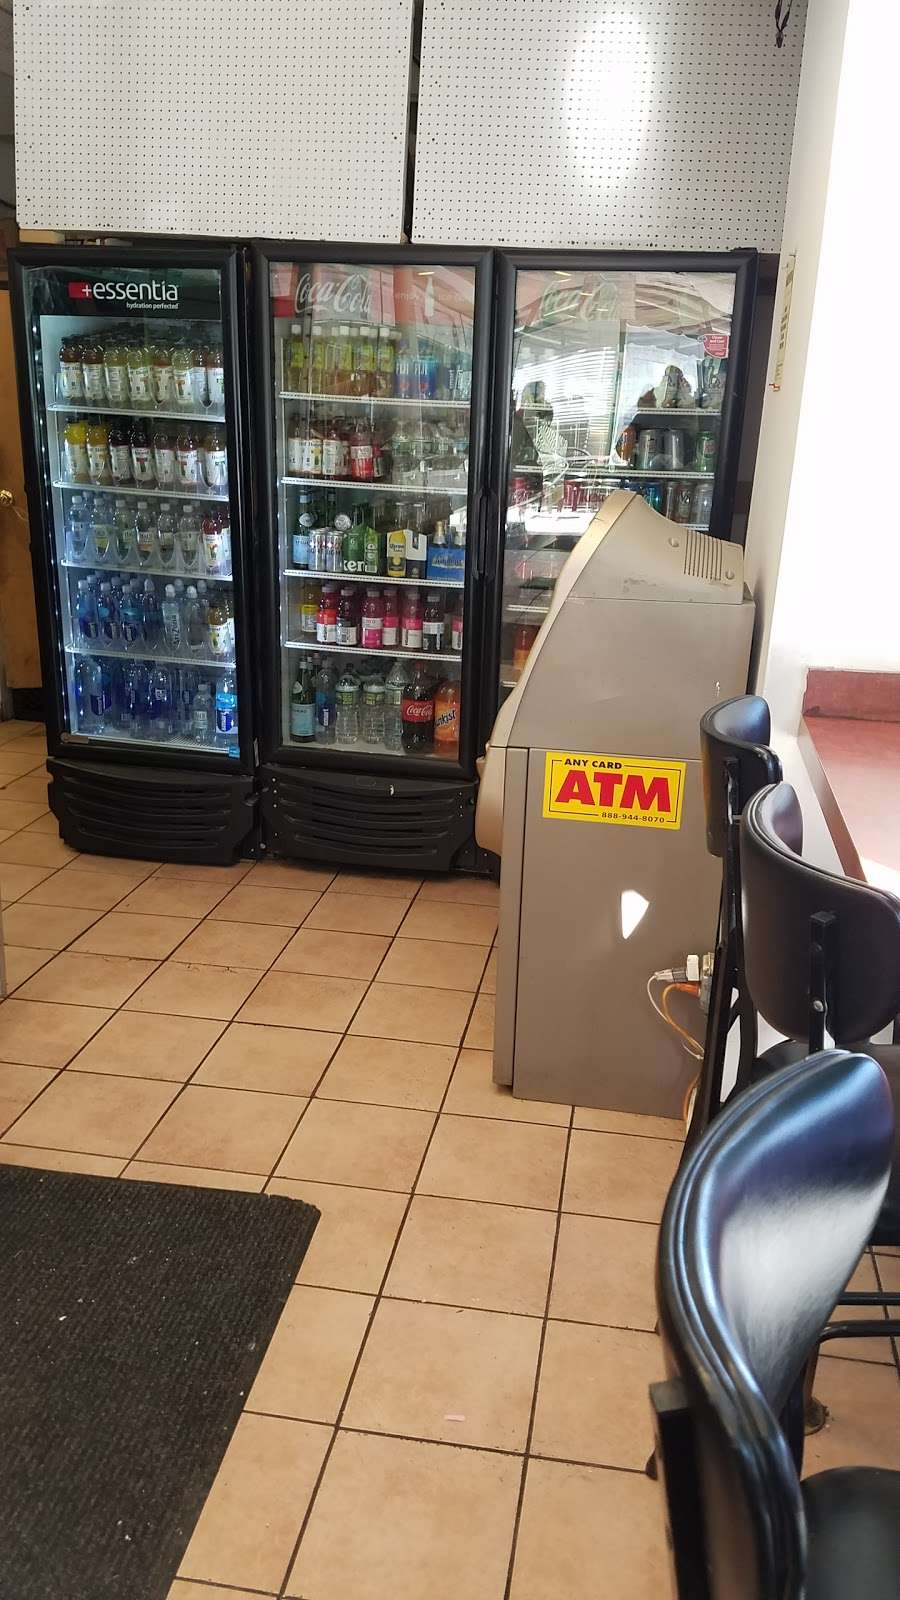 Anycard ATM - atm  | Photo 1 of 3 | Address: 84 Henry St, Brooklyn, NY 11201, USA